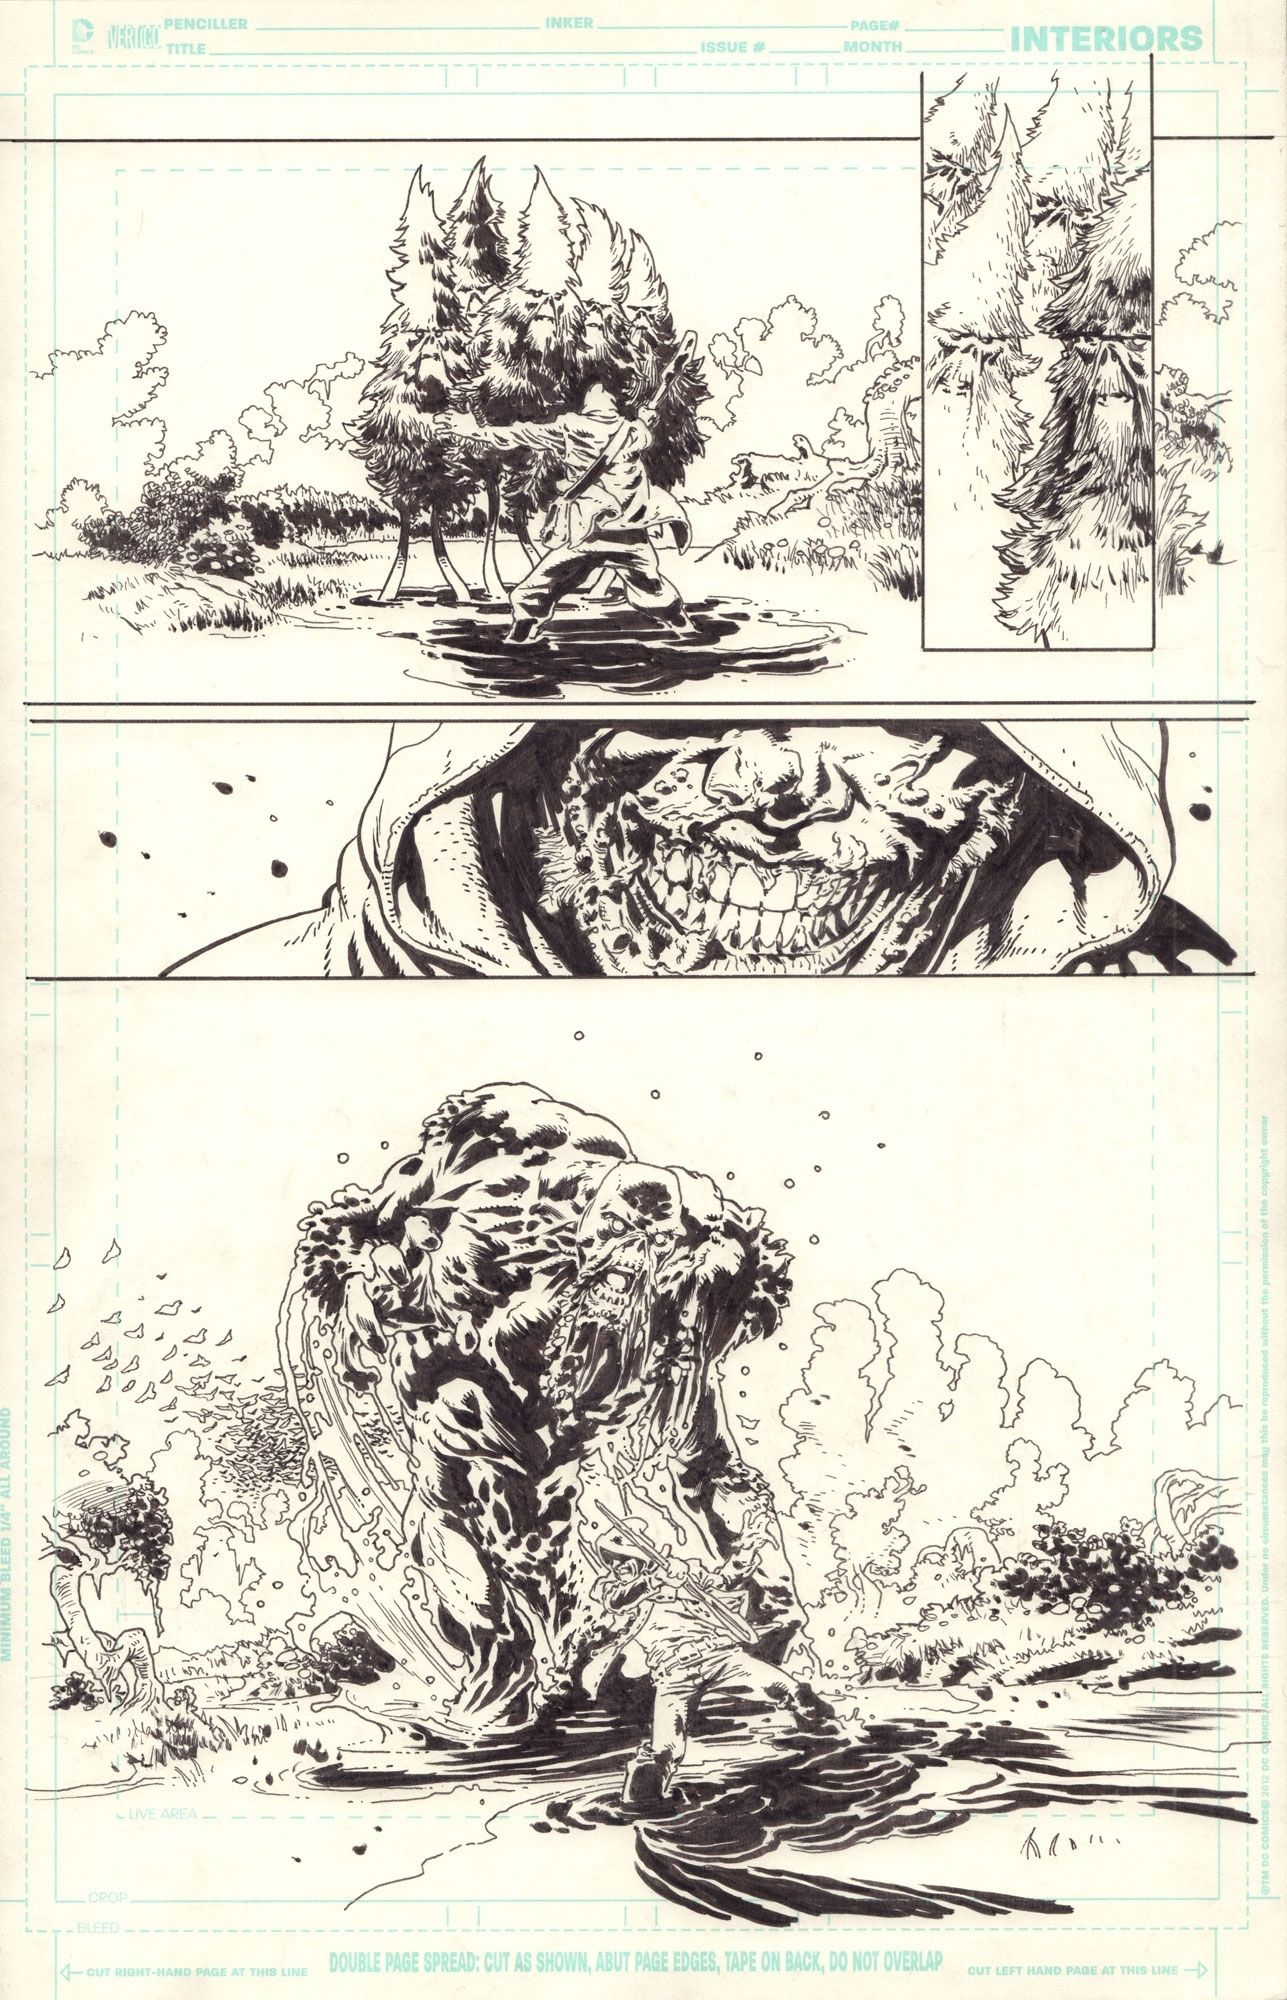 Swamp Thing vol 4 #24 / 6